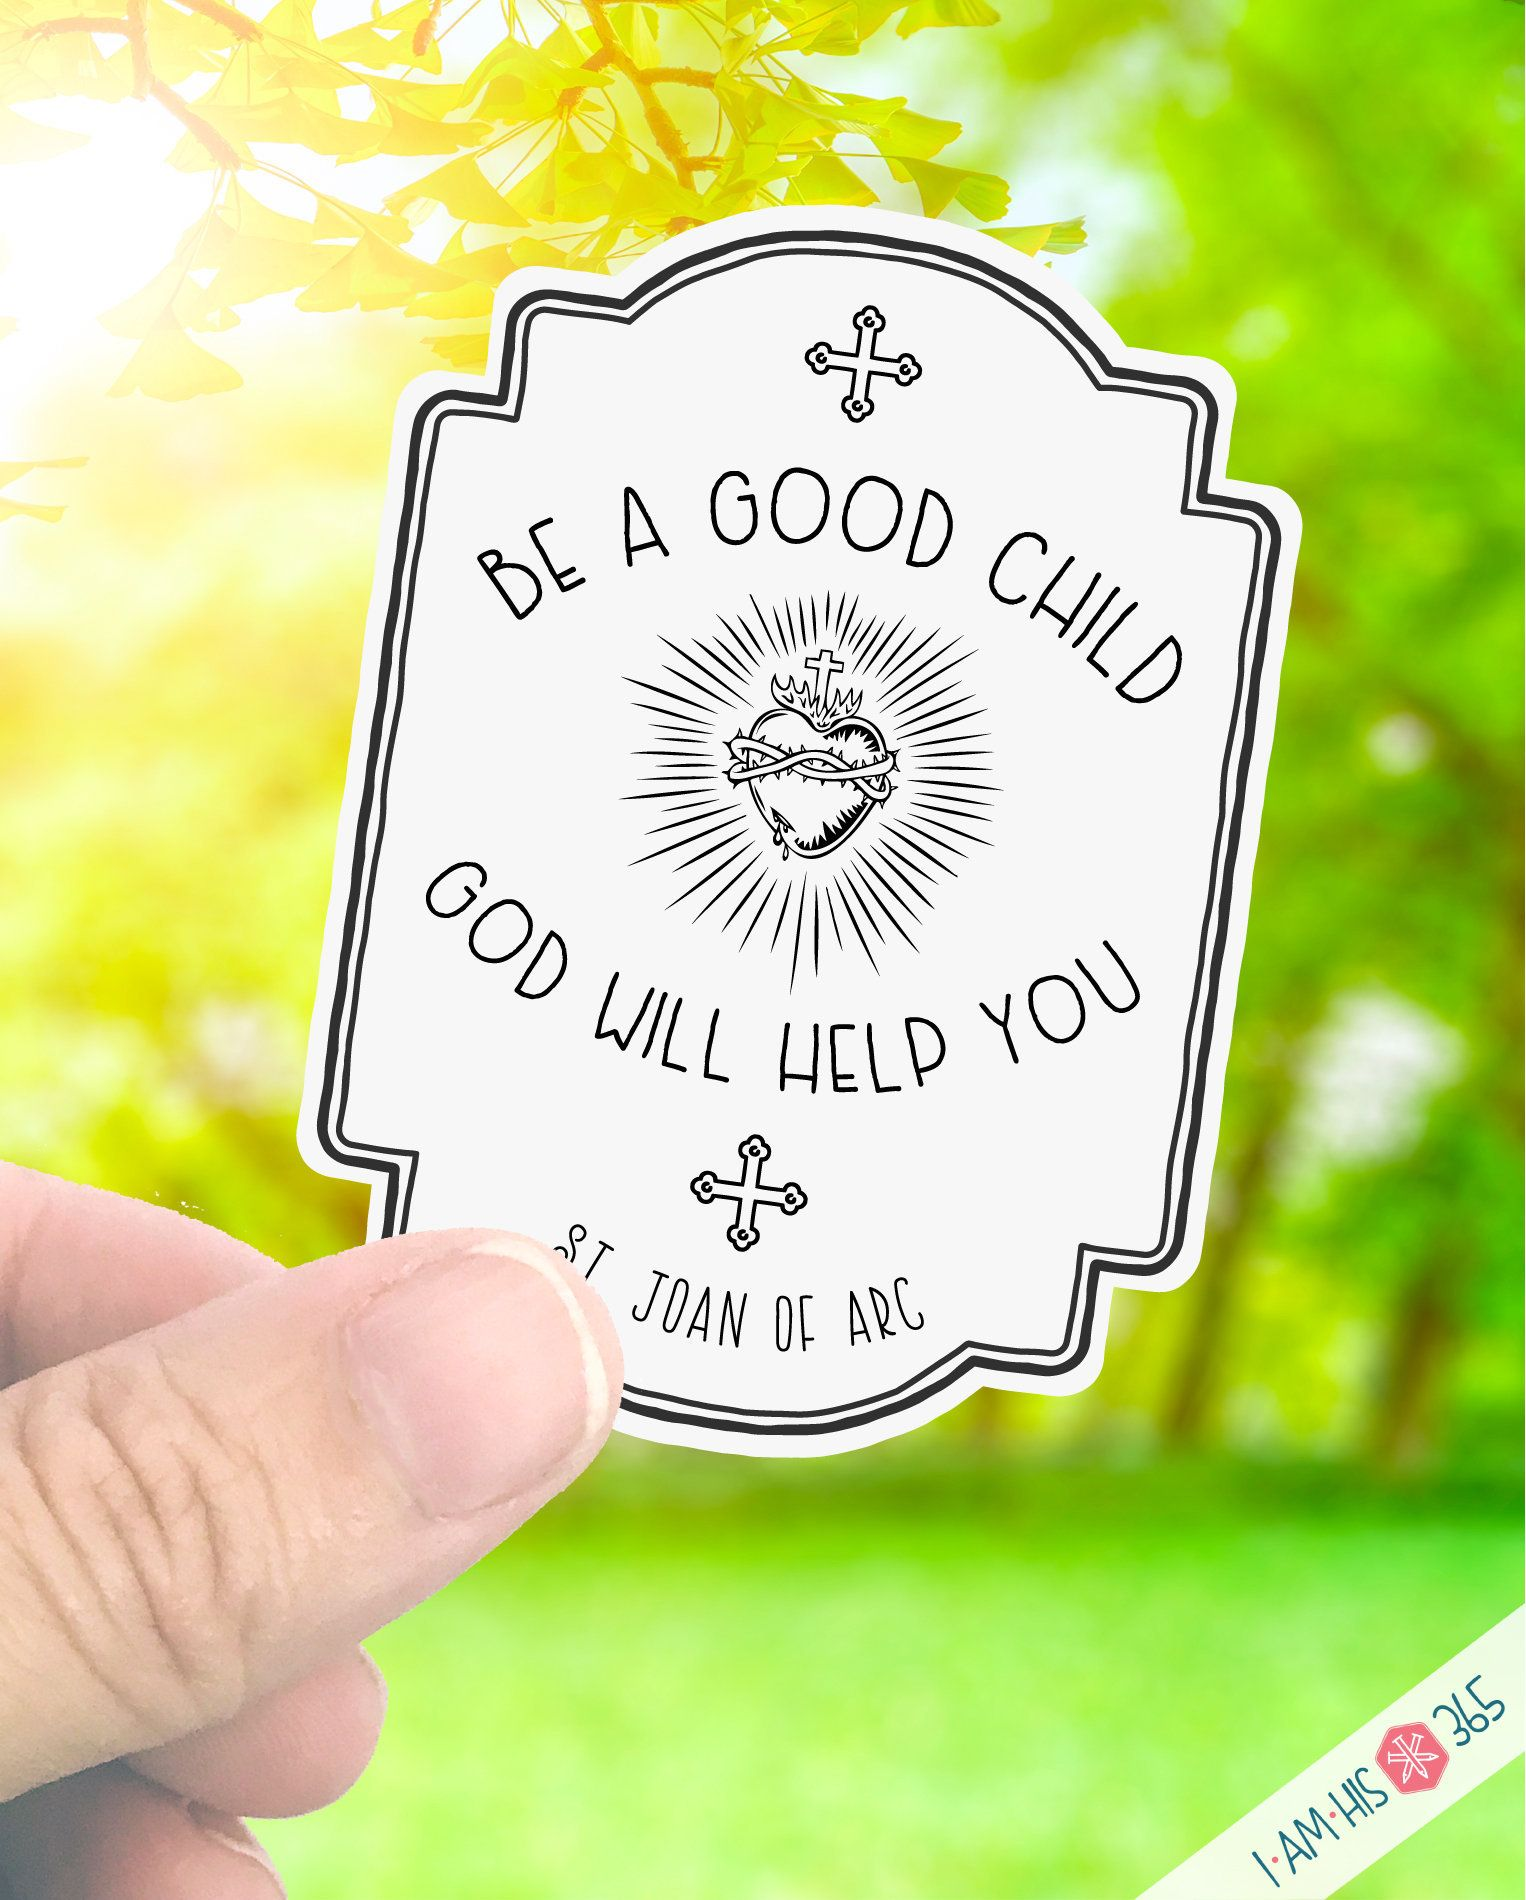 Catholic Saint Sticker Decal St Joan Of Arc Laptop Decal Sticker Water Bottle Sticker With Images Laptop Decal Stickers Bottle Stickers Laptop Decal [ 1900 x 1526 Pixel ]